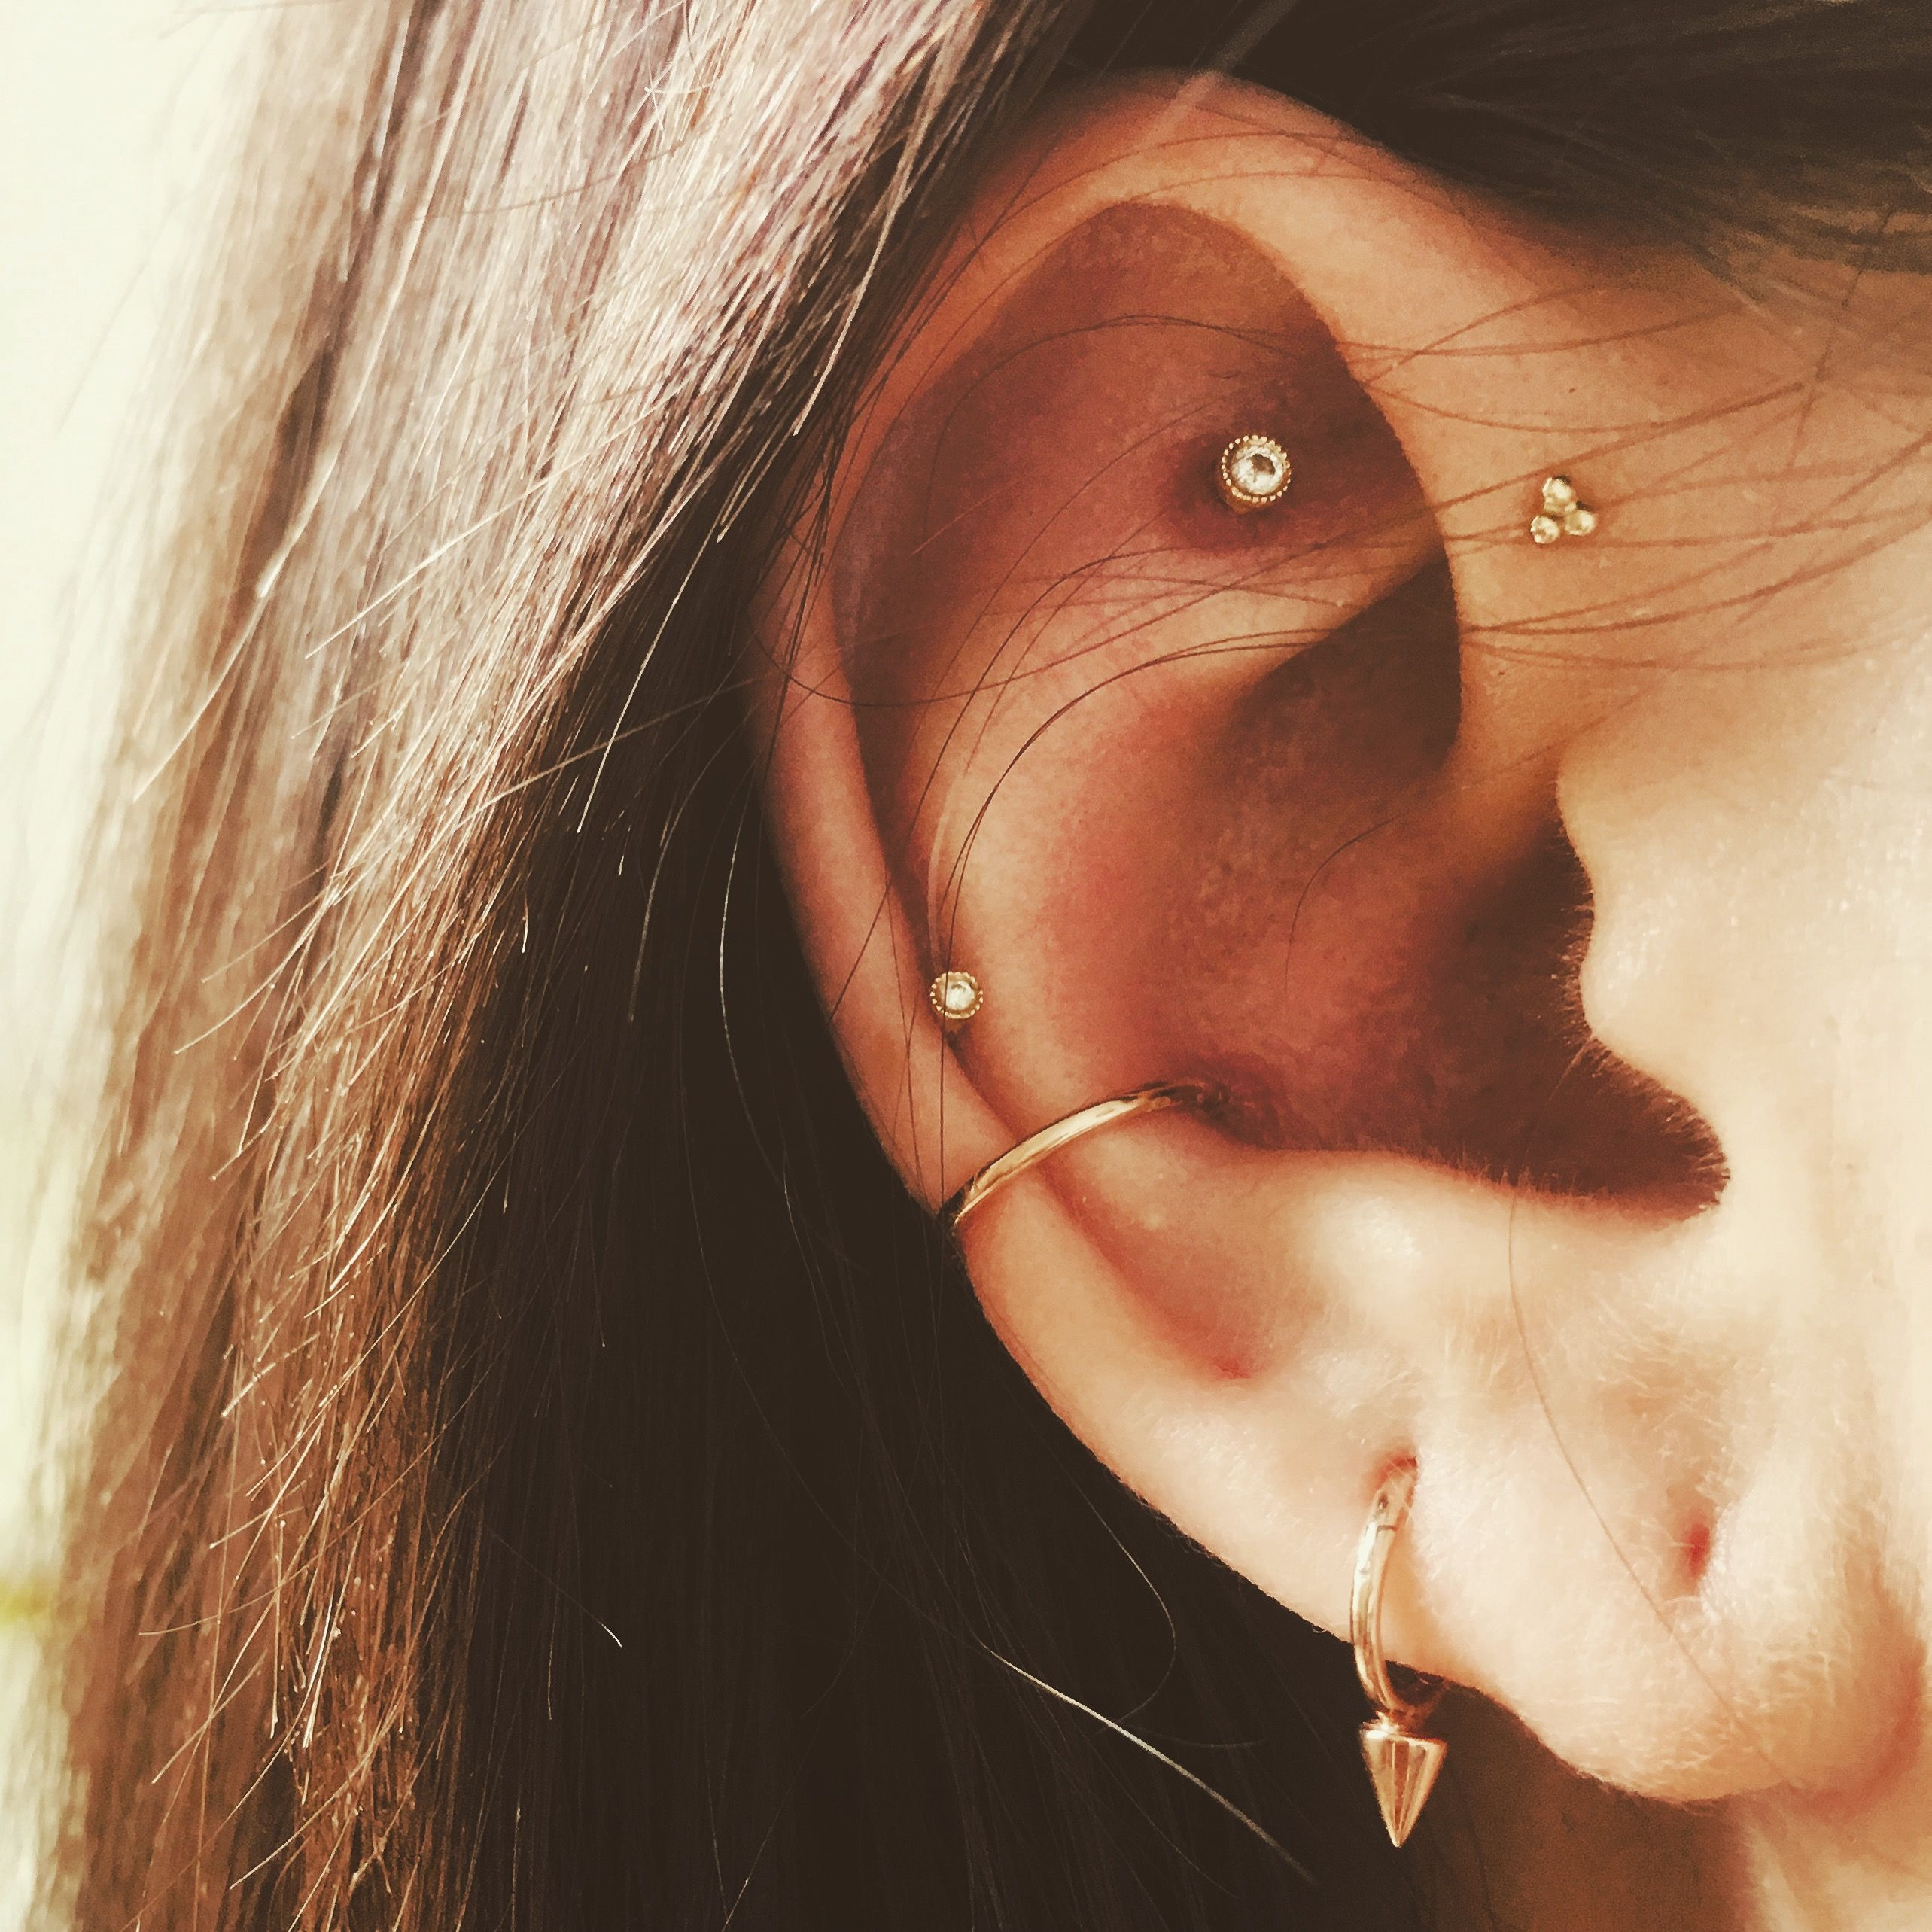 Double nose piercing  Conch forward helix and Tash Rook piercings mariatashlondon